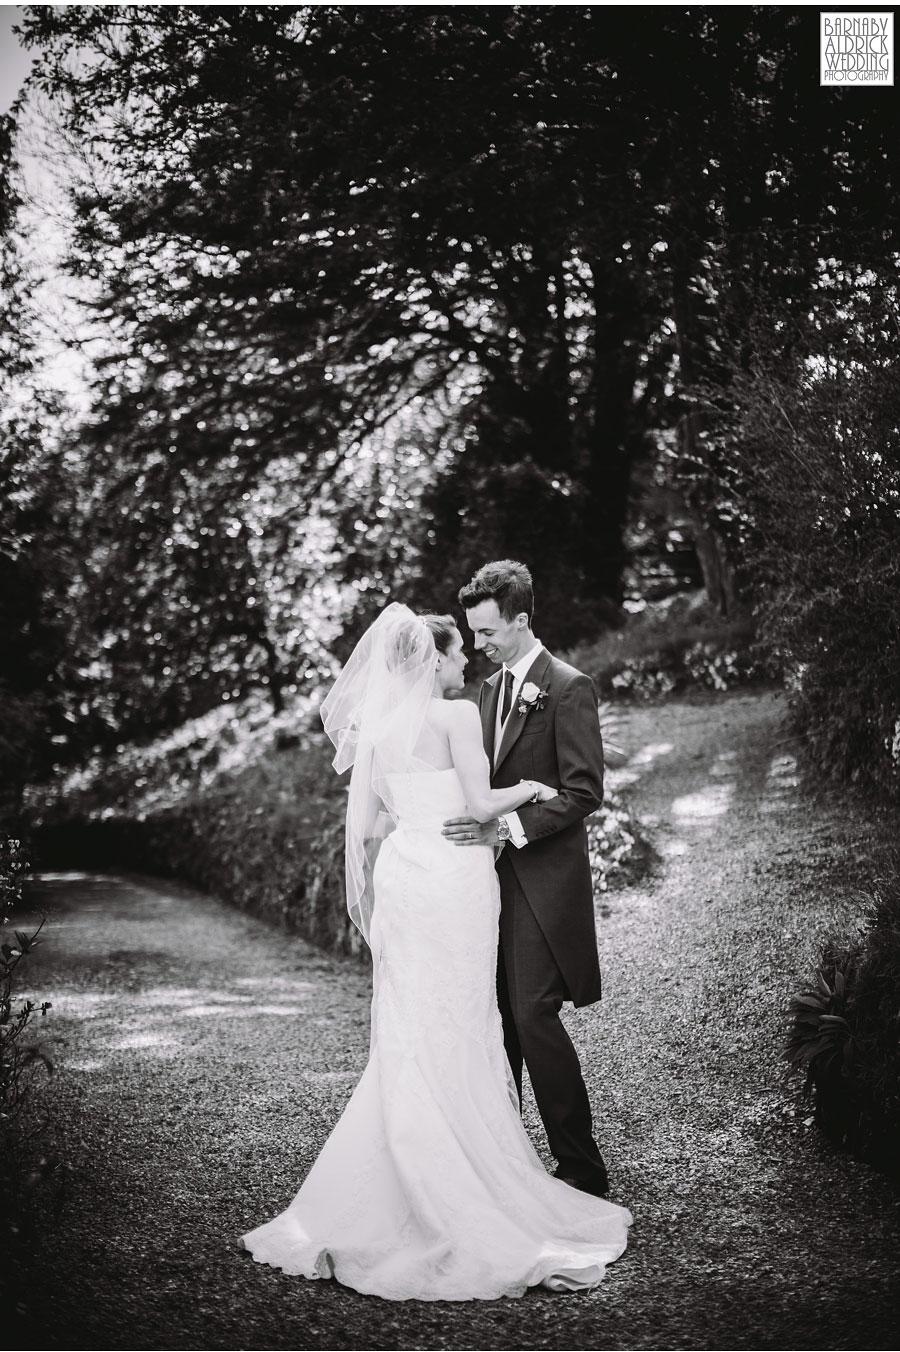 Wedding Photography at Buckland Tout Saints South Devon, Devon Wedding Photographer Barnaby Aldrick, Dartmouth Wedding; Kingswear Devon Wedding, 072